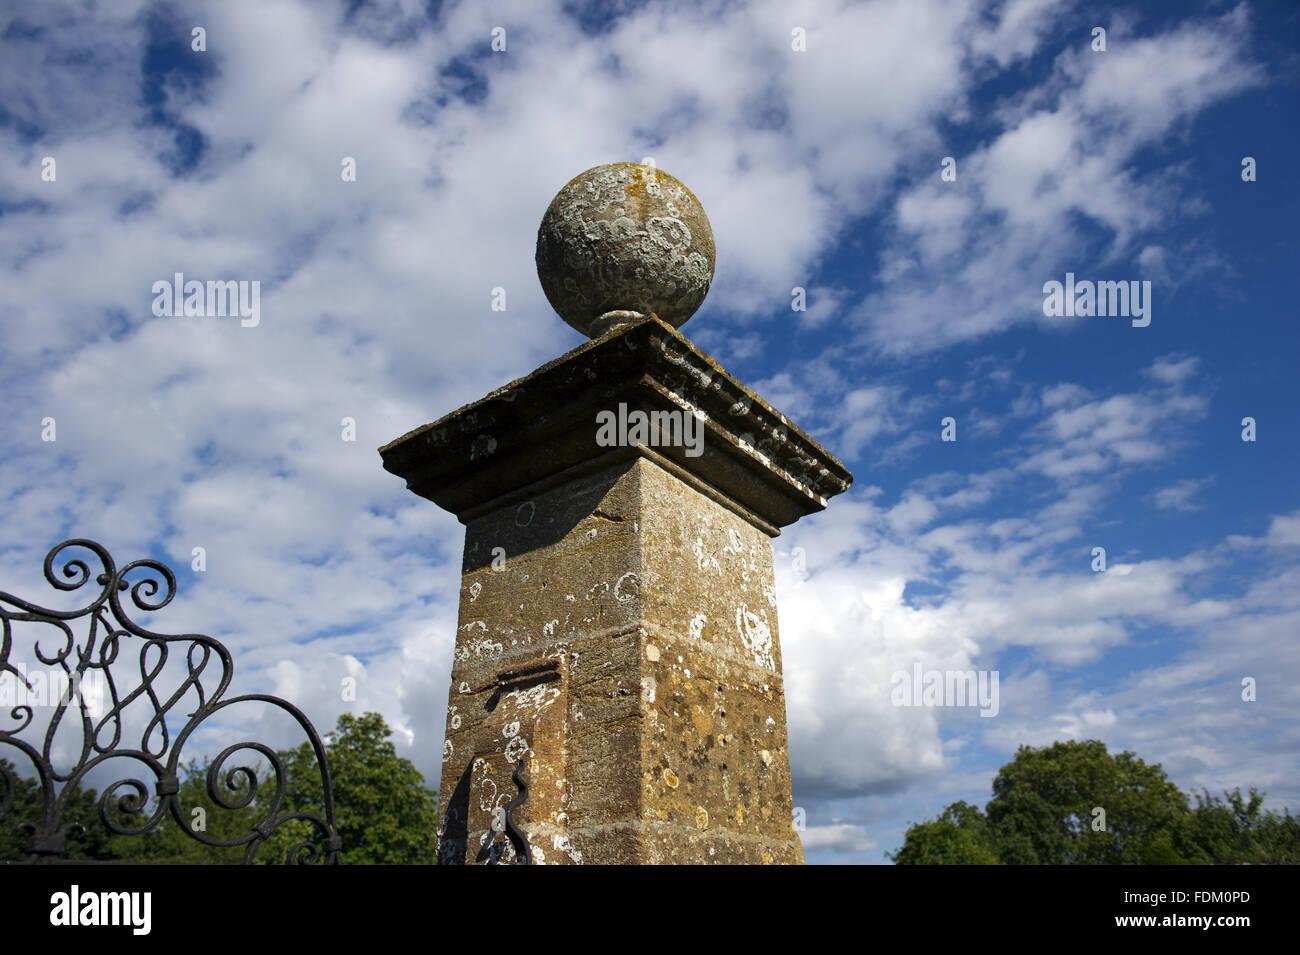 Stone ball atop a gatepost at Lytes Cary Manor, Somerset. - Stock Image